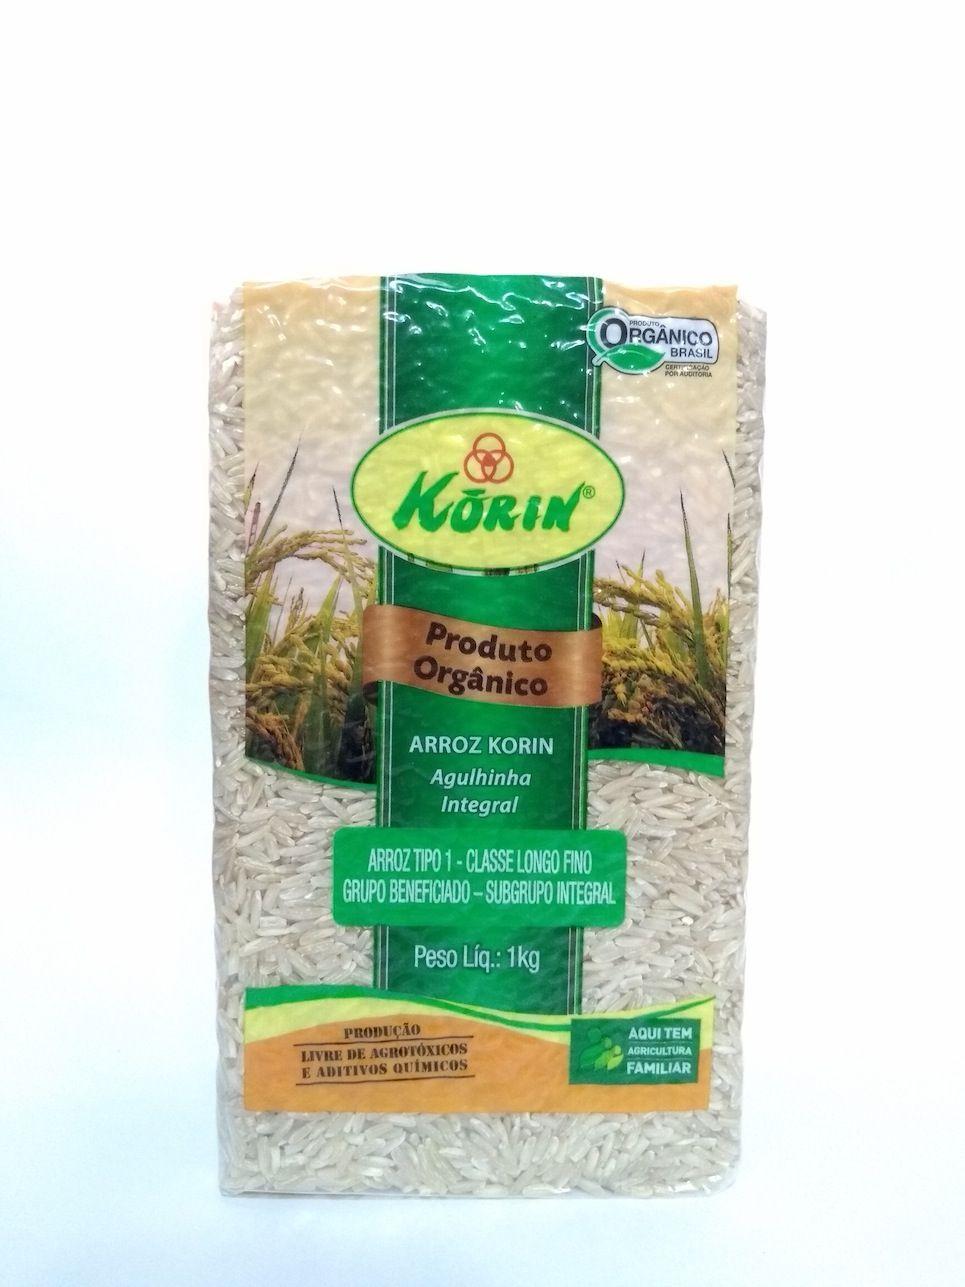 Arroz agulhinha integral orgânico, 1kg – Korin